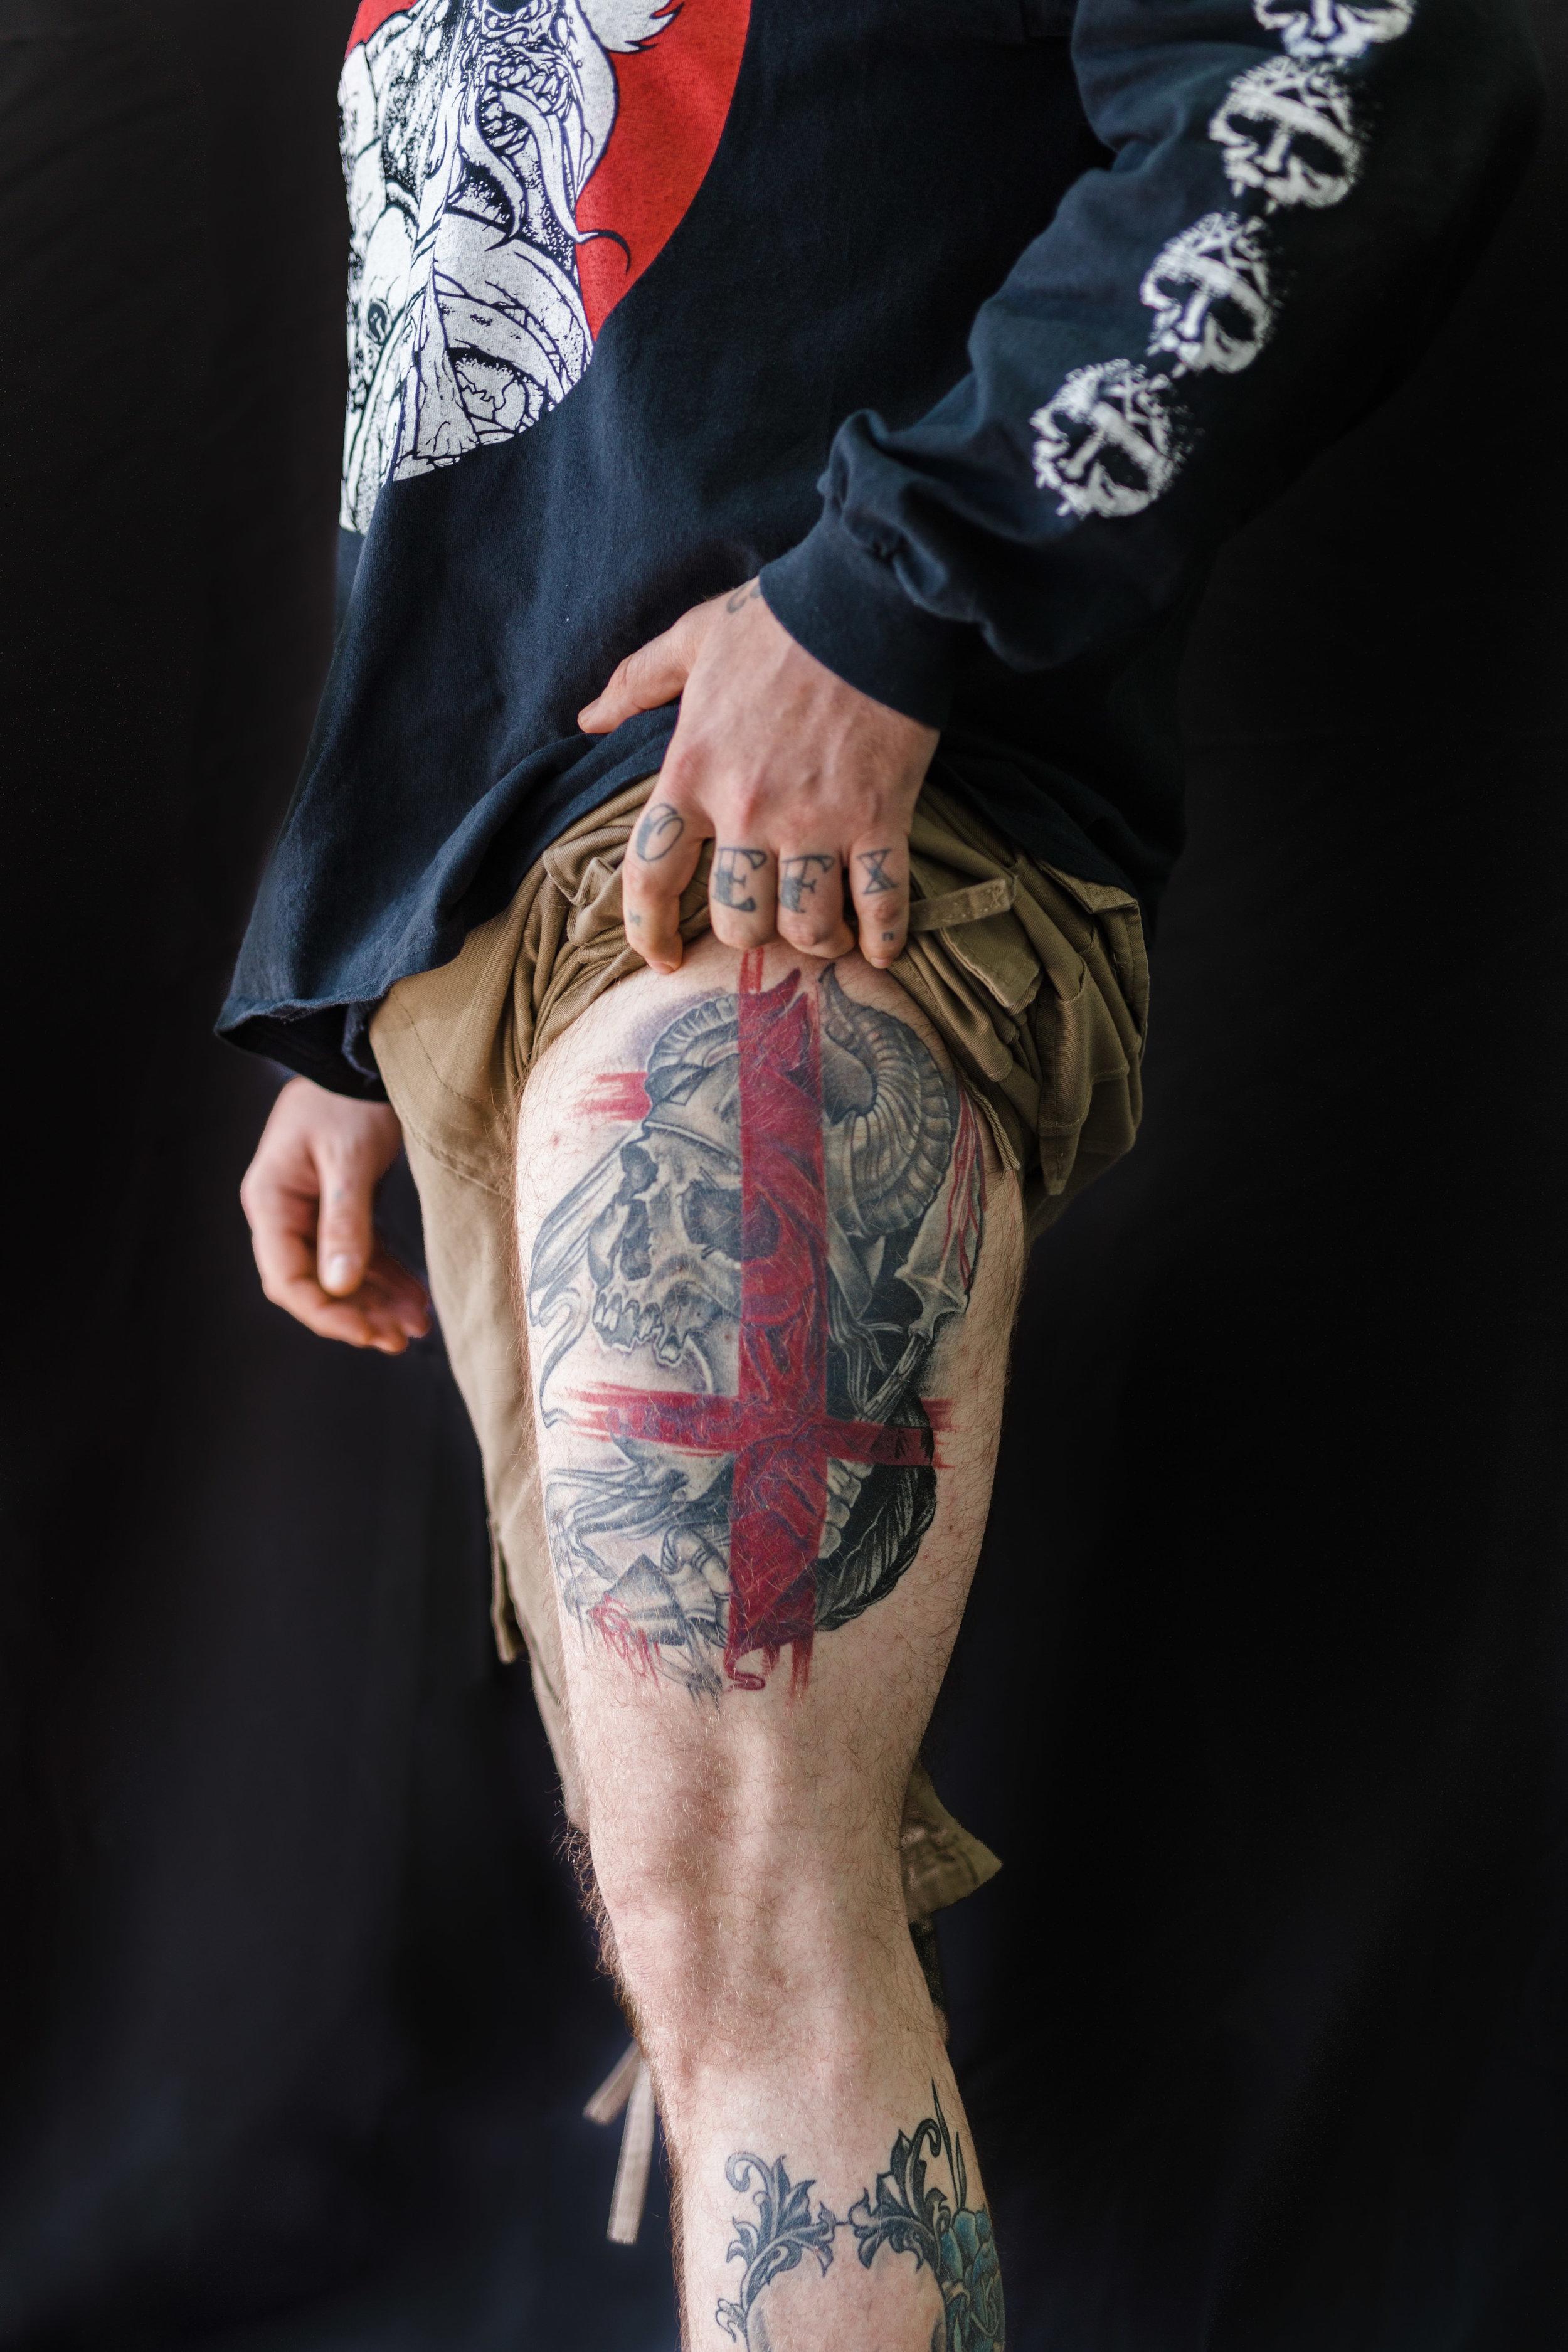 Needle Ink The Heathen Ways Of Overeducated Tattoo Artists